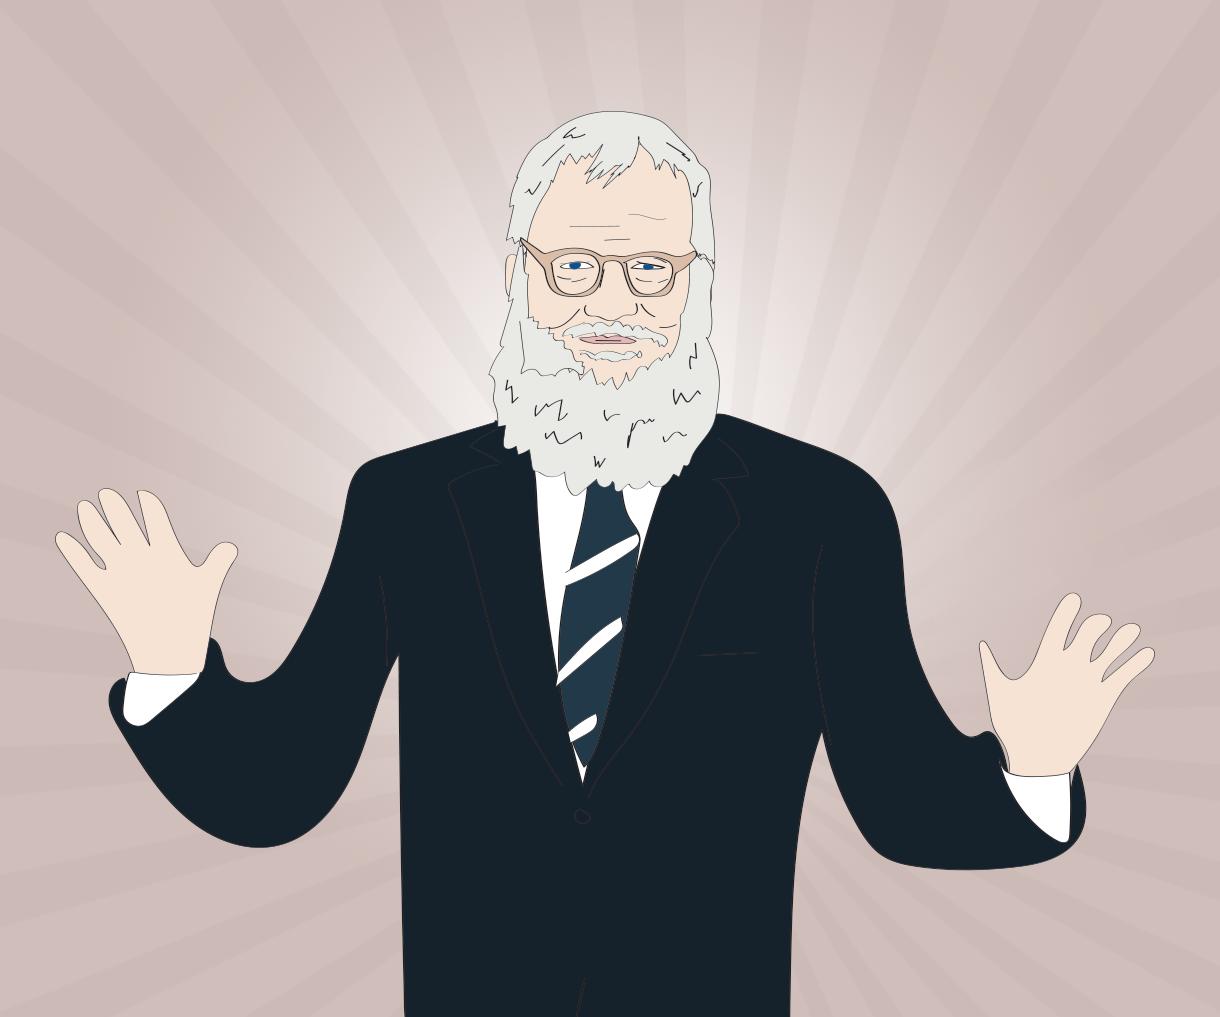 David Letterman illustration, Drawn for You